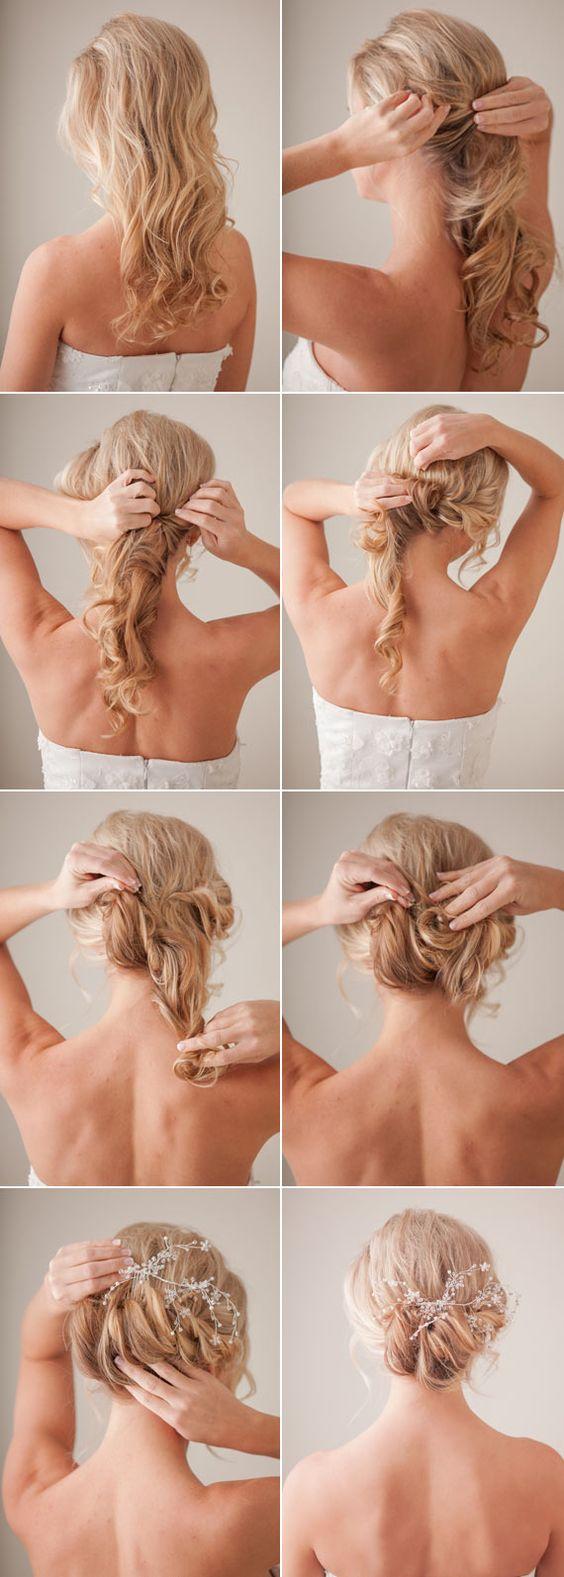 Terrific Hair Tutorials For Special Occassions Hair Tutorials Bridal Short Hairstyles For Black Women Fulllsitofus